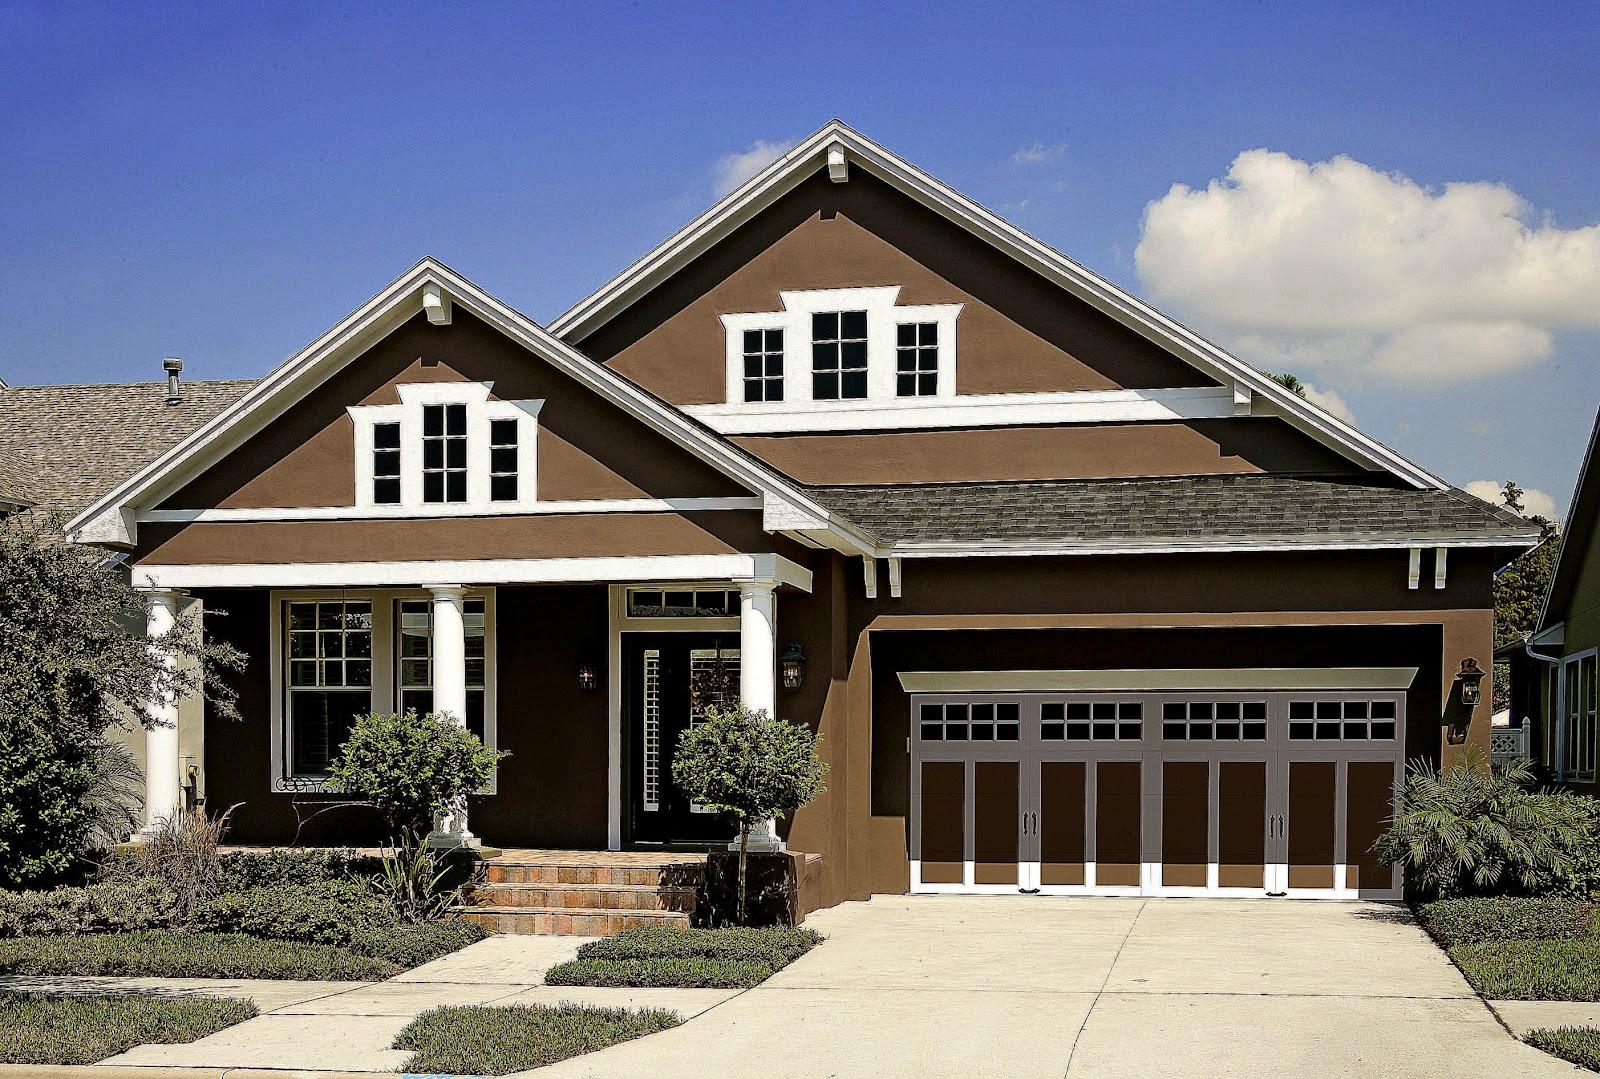 Exterior House Color Schemes Pictures Free Coloring Rh Freecoloringpicturesall Blo Com